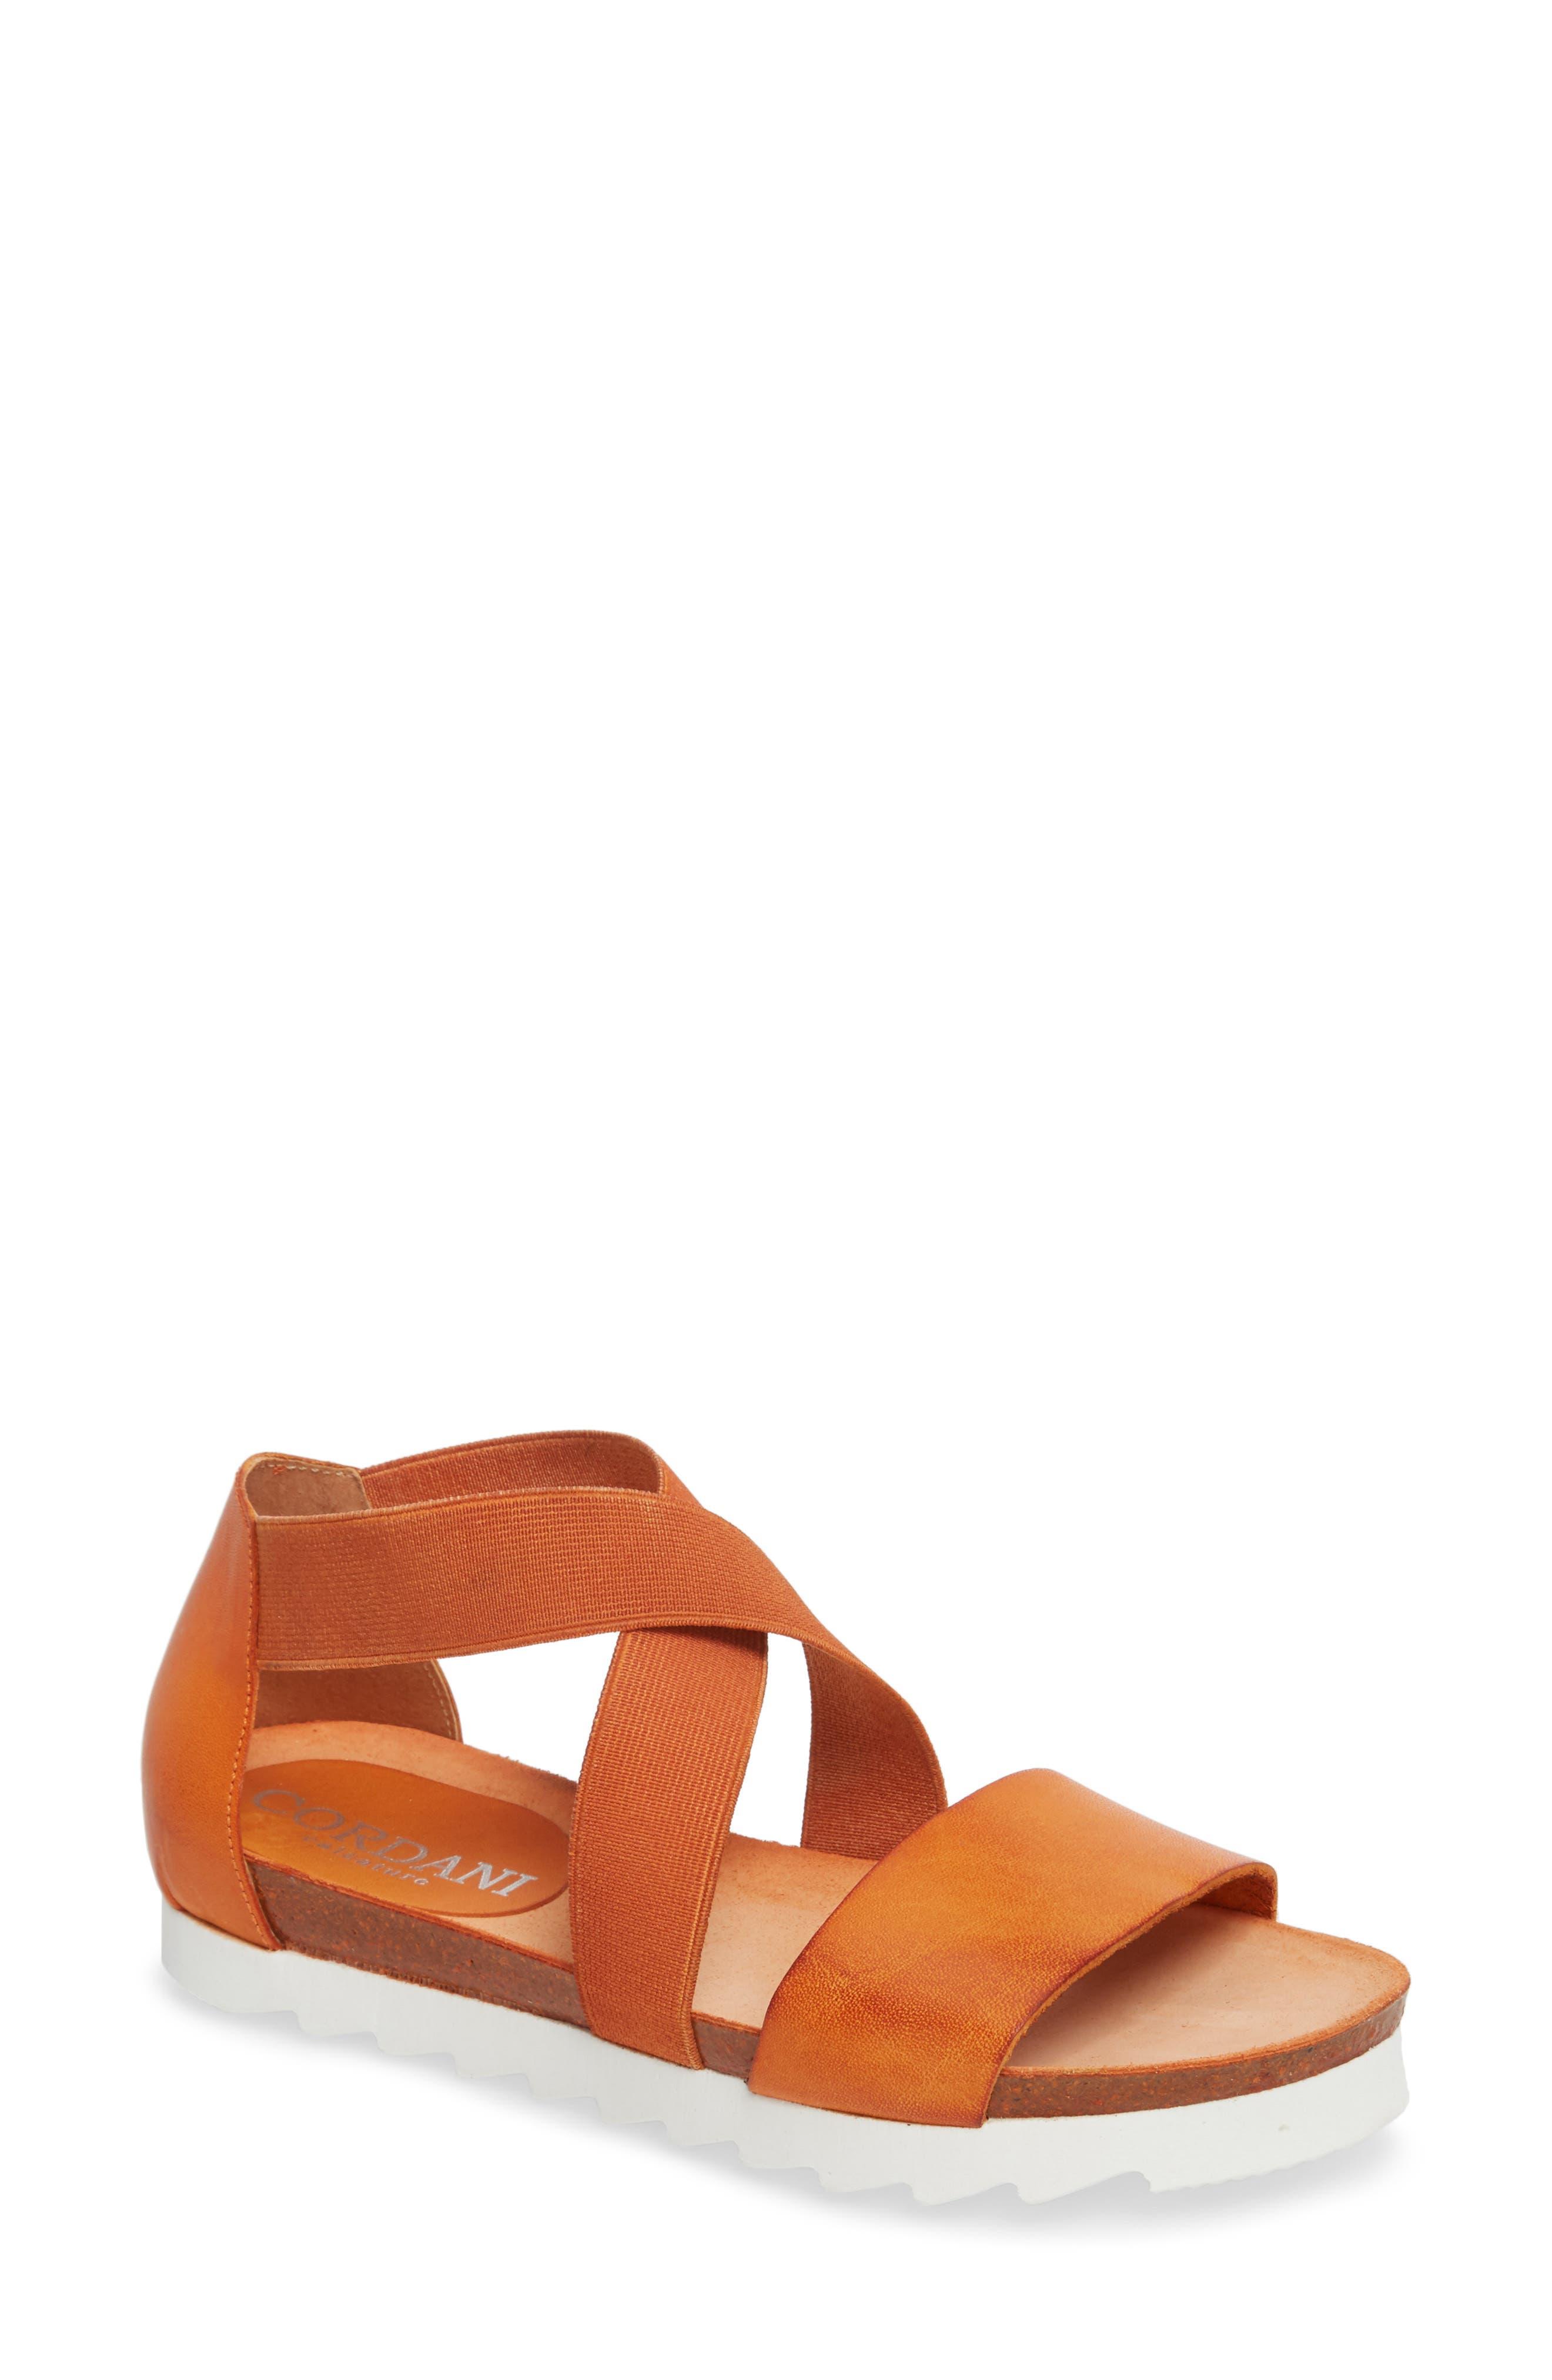 Sayger Sandal,                             Main thumbnail 1, color,                             Orange Leather